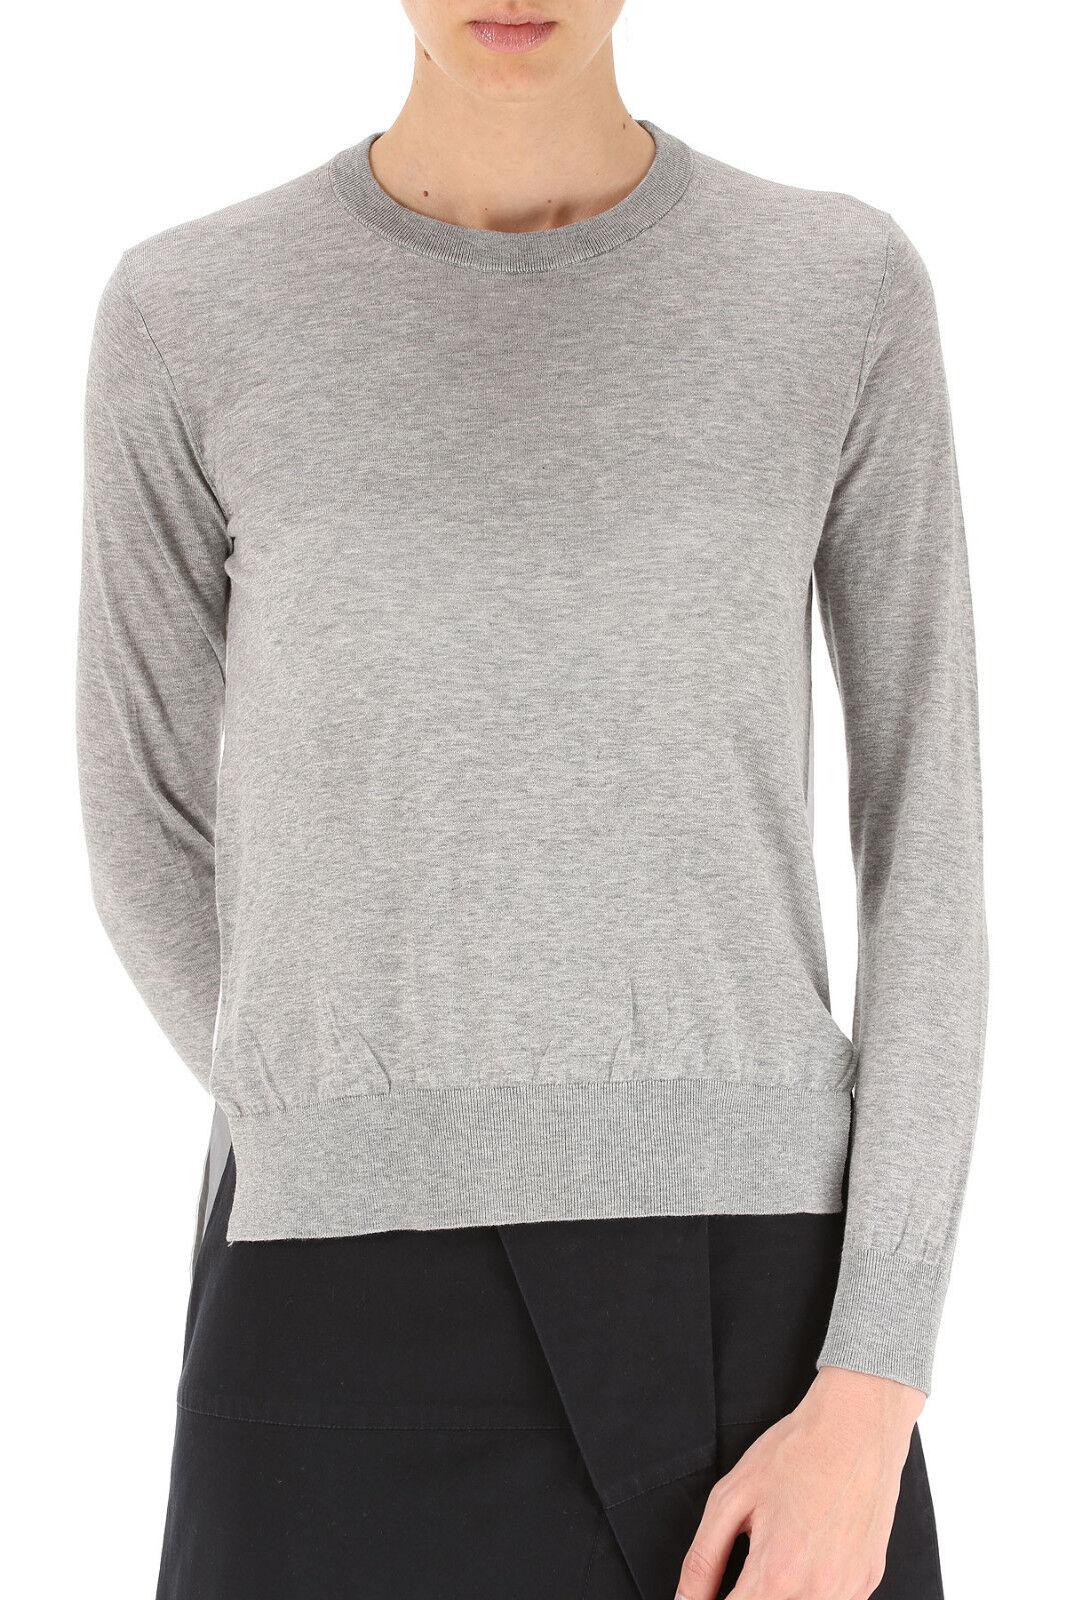 Marc by Marc Jacobs Maglia cotone, cotone, cotone, Mercy cotton sweater 665693